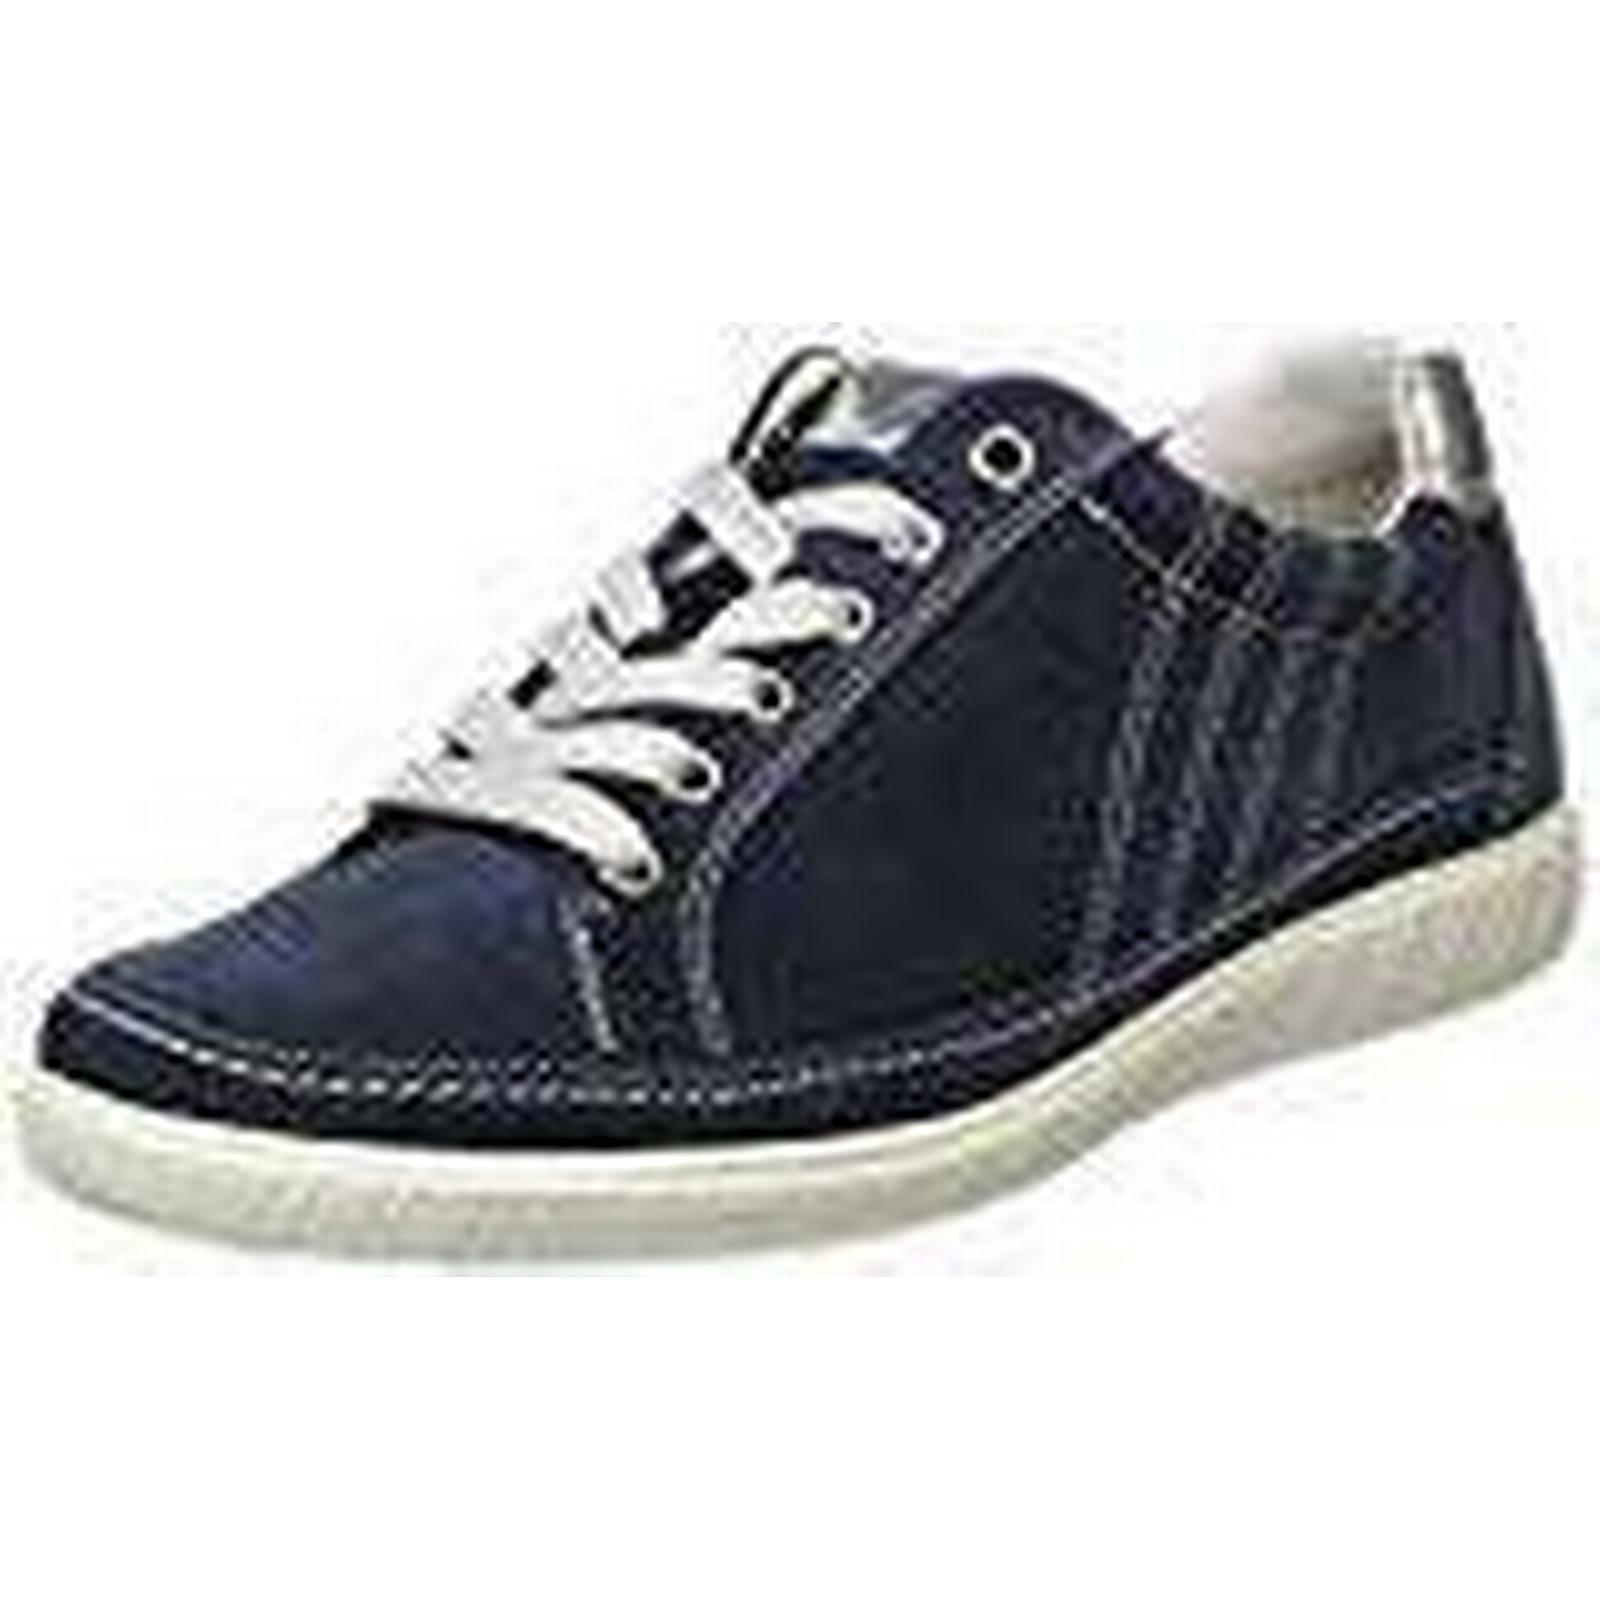 Gabor Shoes Women's Comfort Basic UK Derbys, Blue (Ocean/Argento), 7 UK Basic (40.5 EU) 72d933